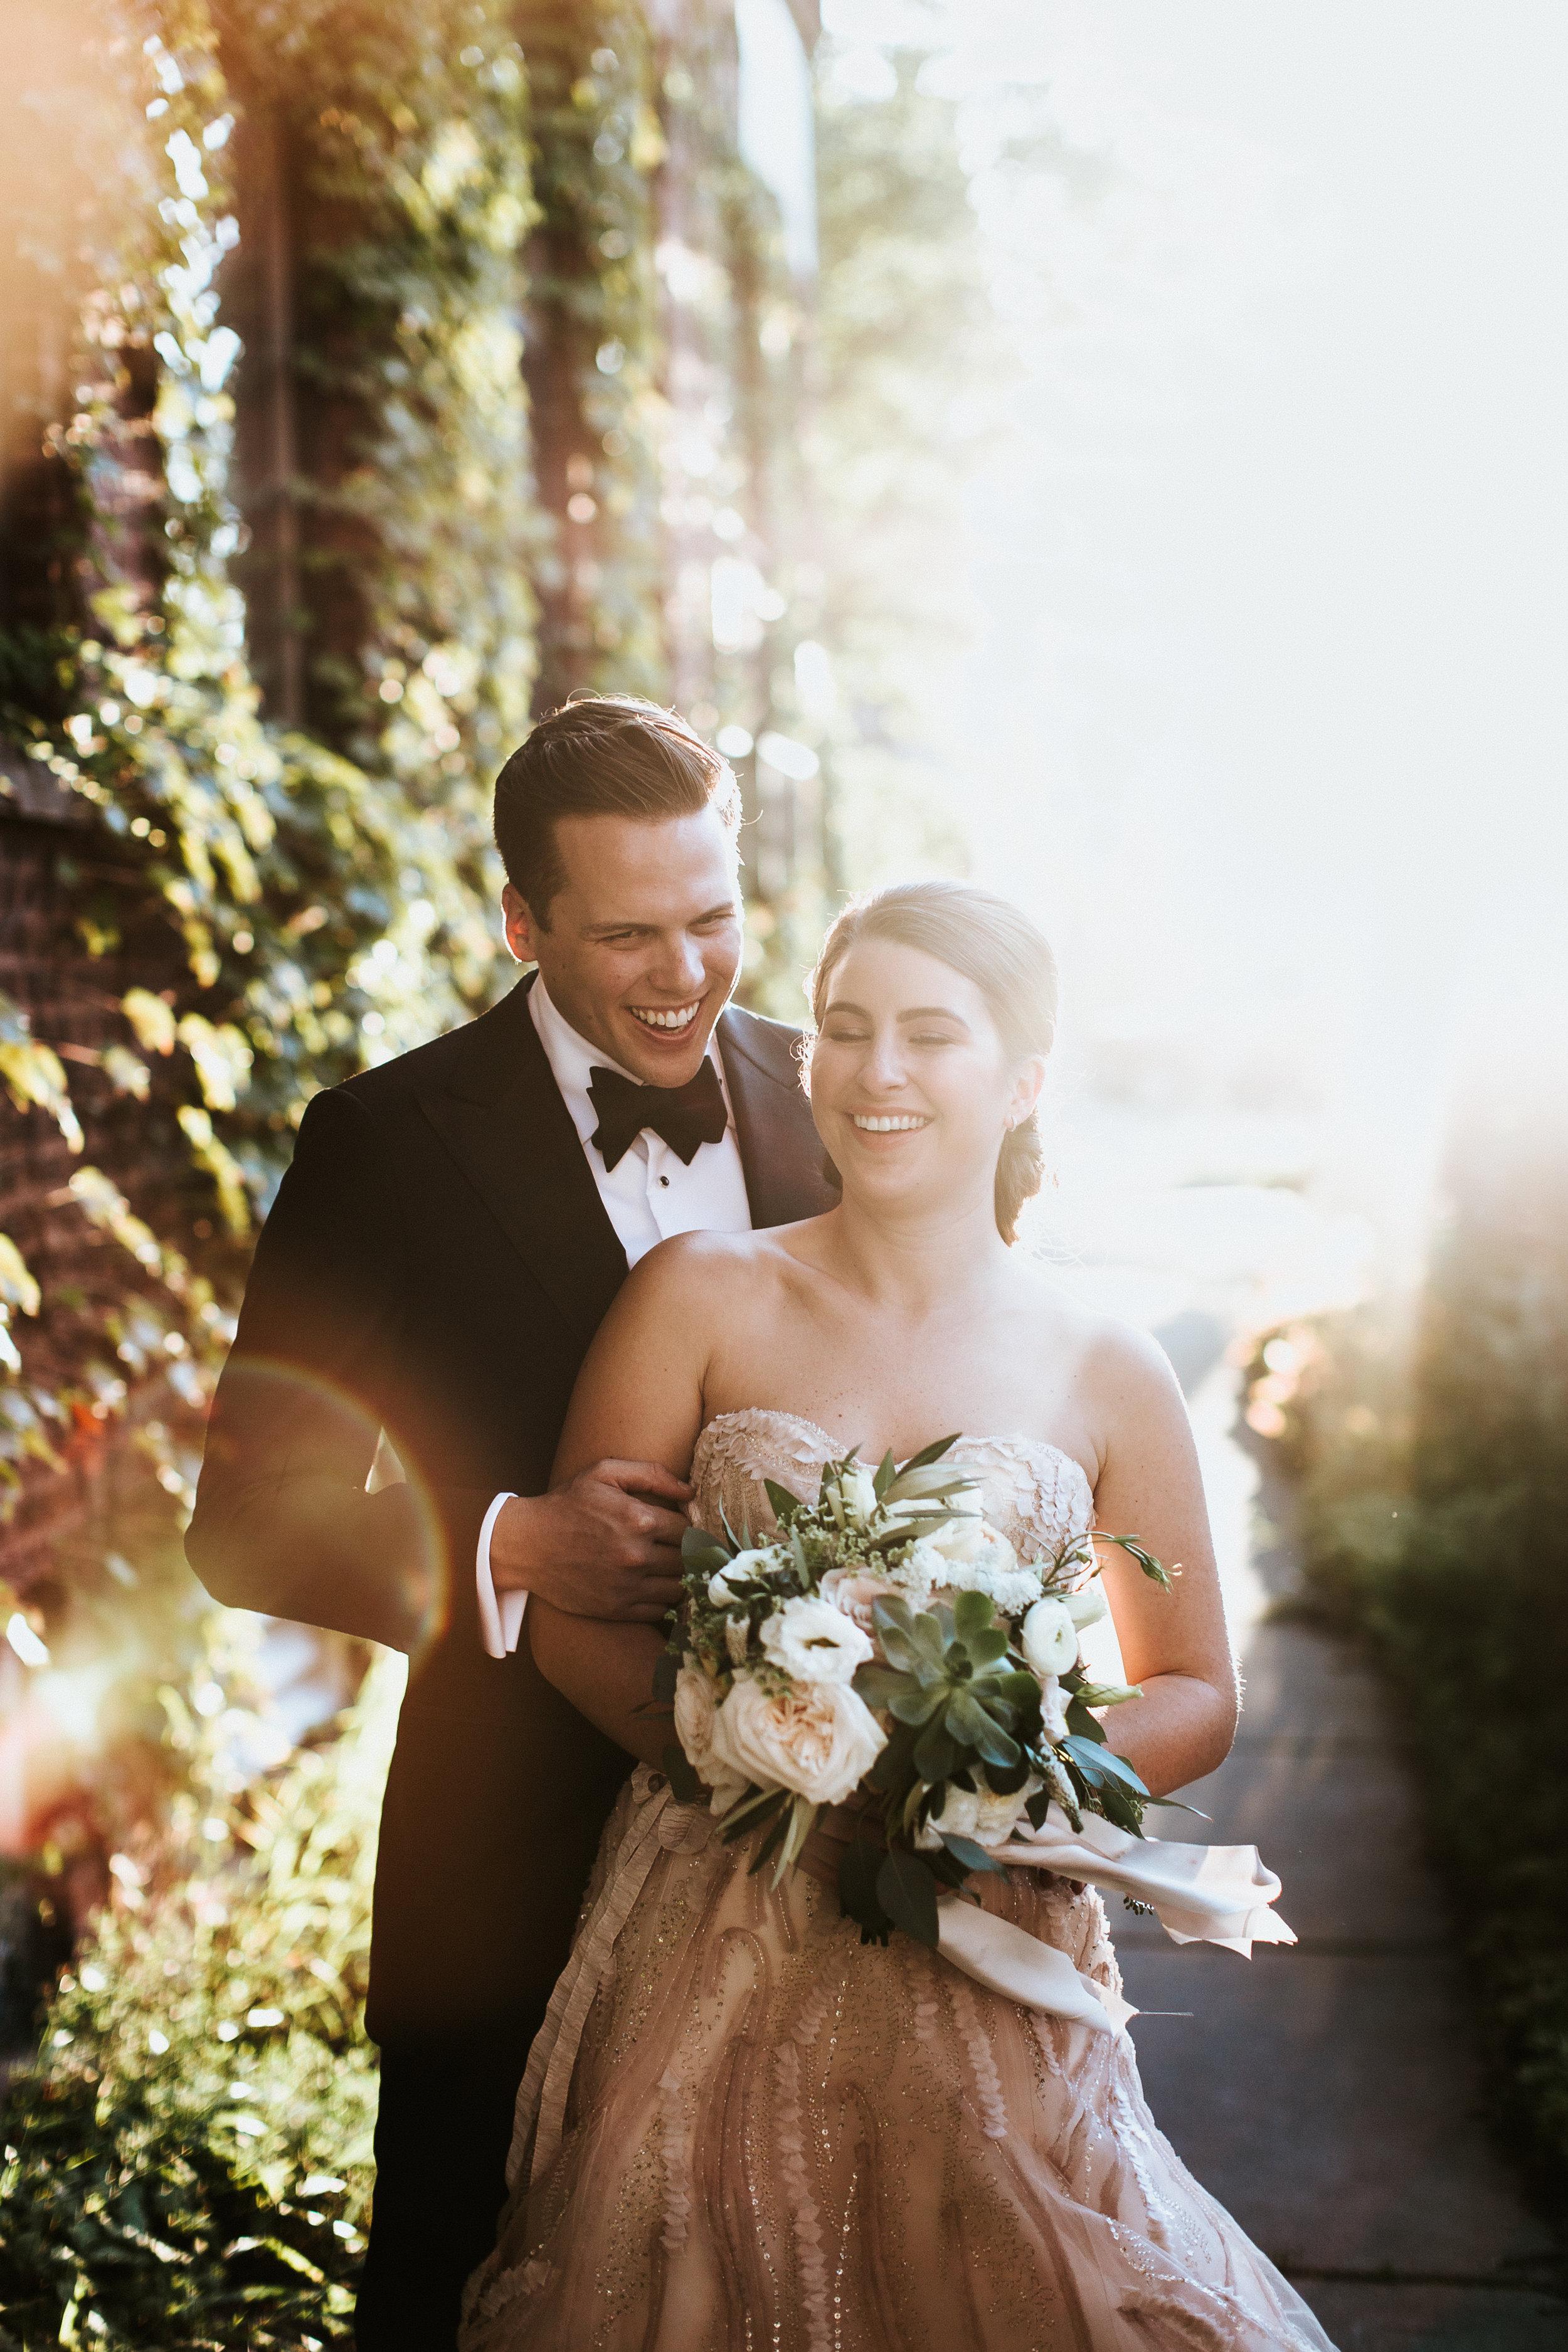 LJ-Wedding-(TODD_JAMES_PHOTOGRAPHY)-39.jpg